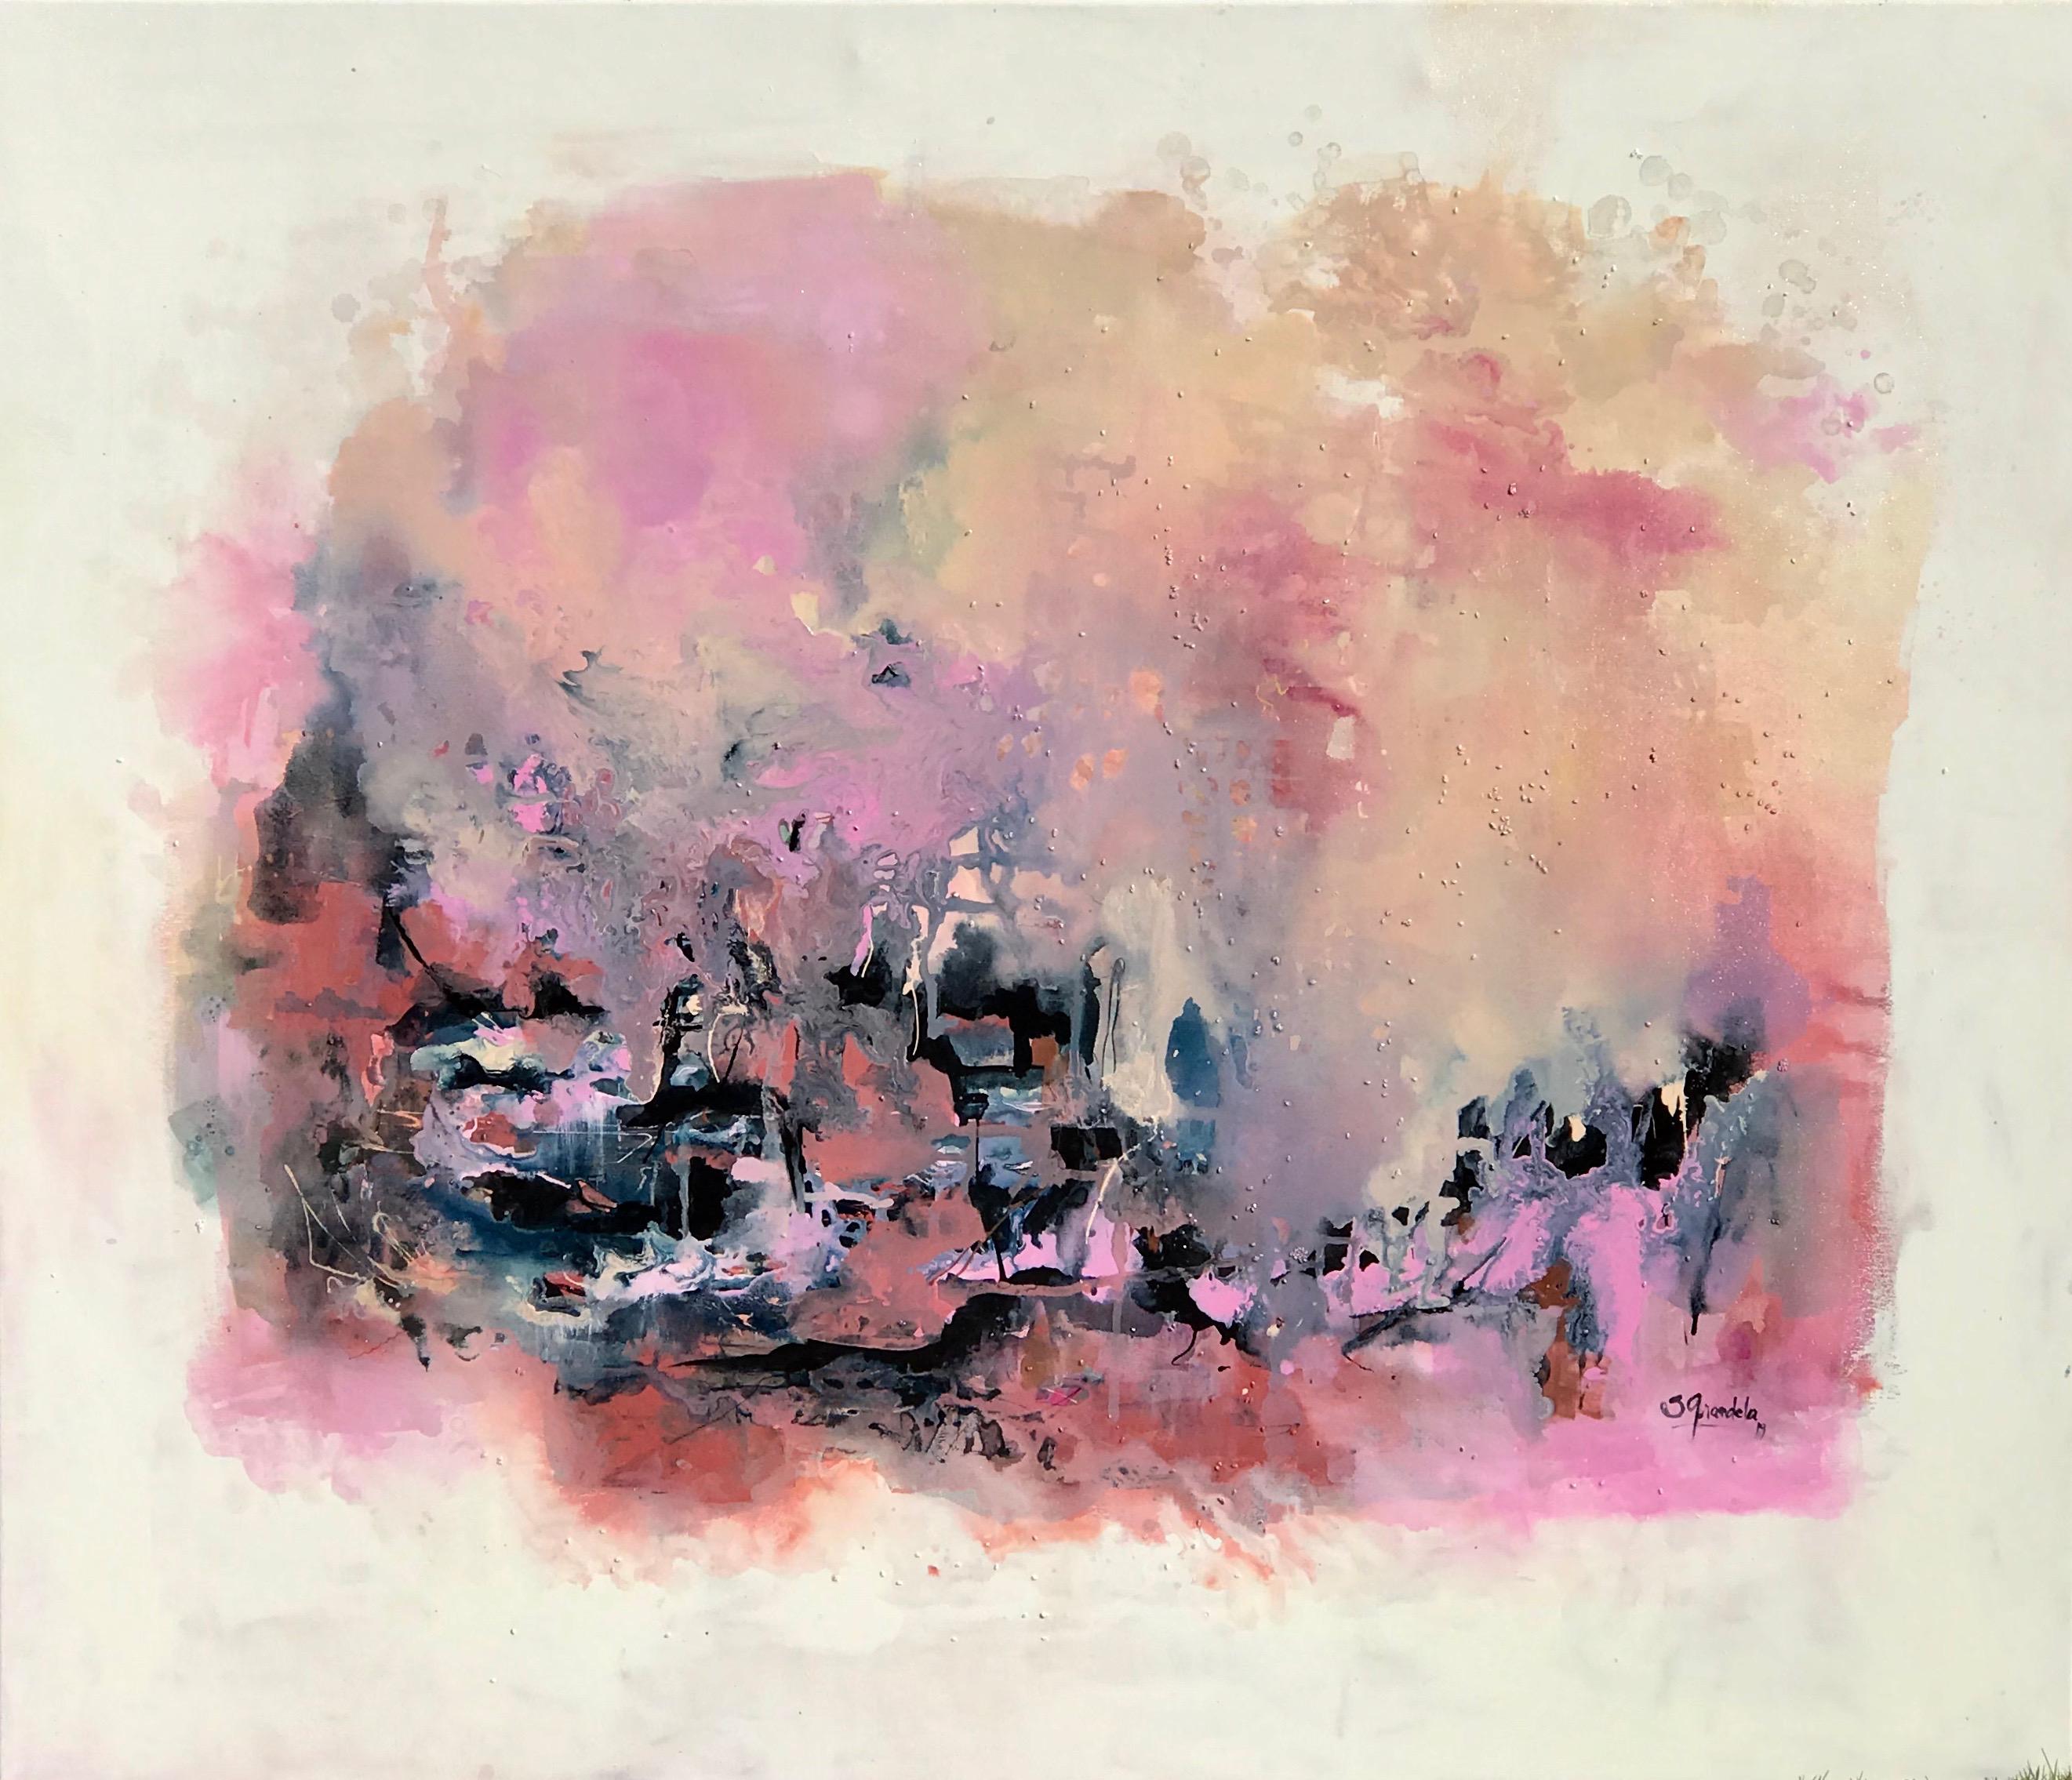 MELTED SKY (2019) - Silvia Grandela